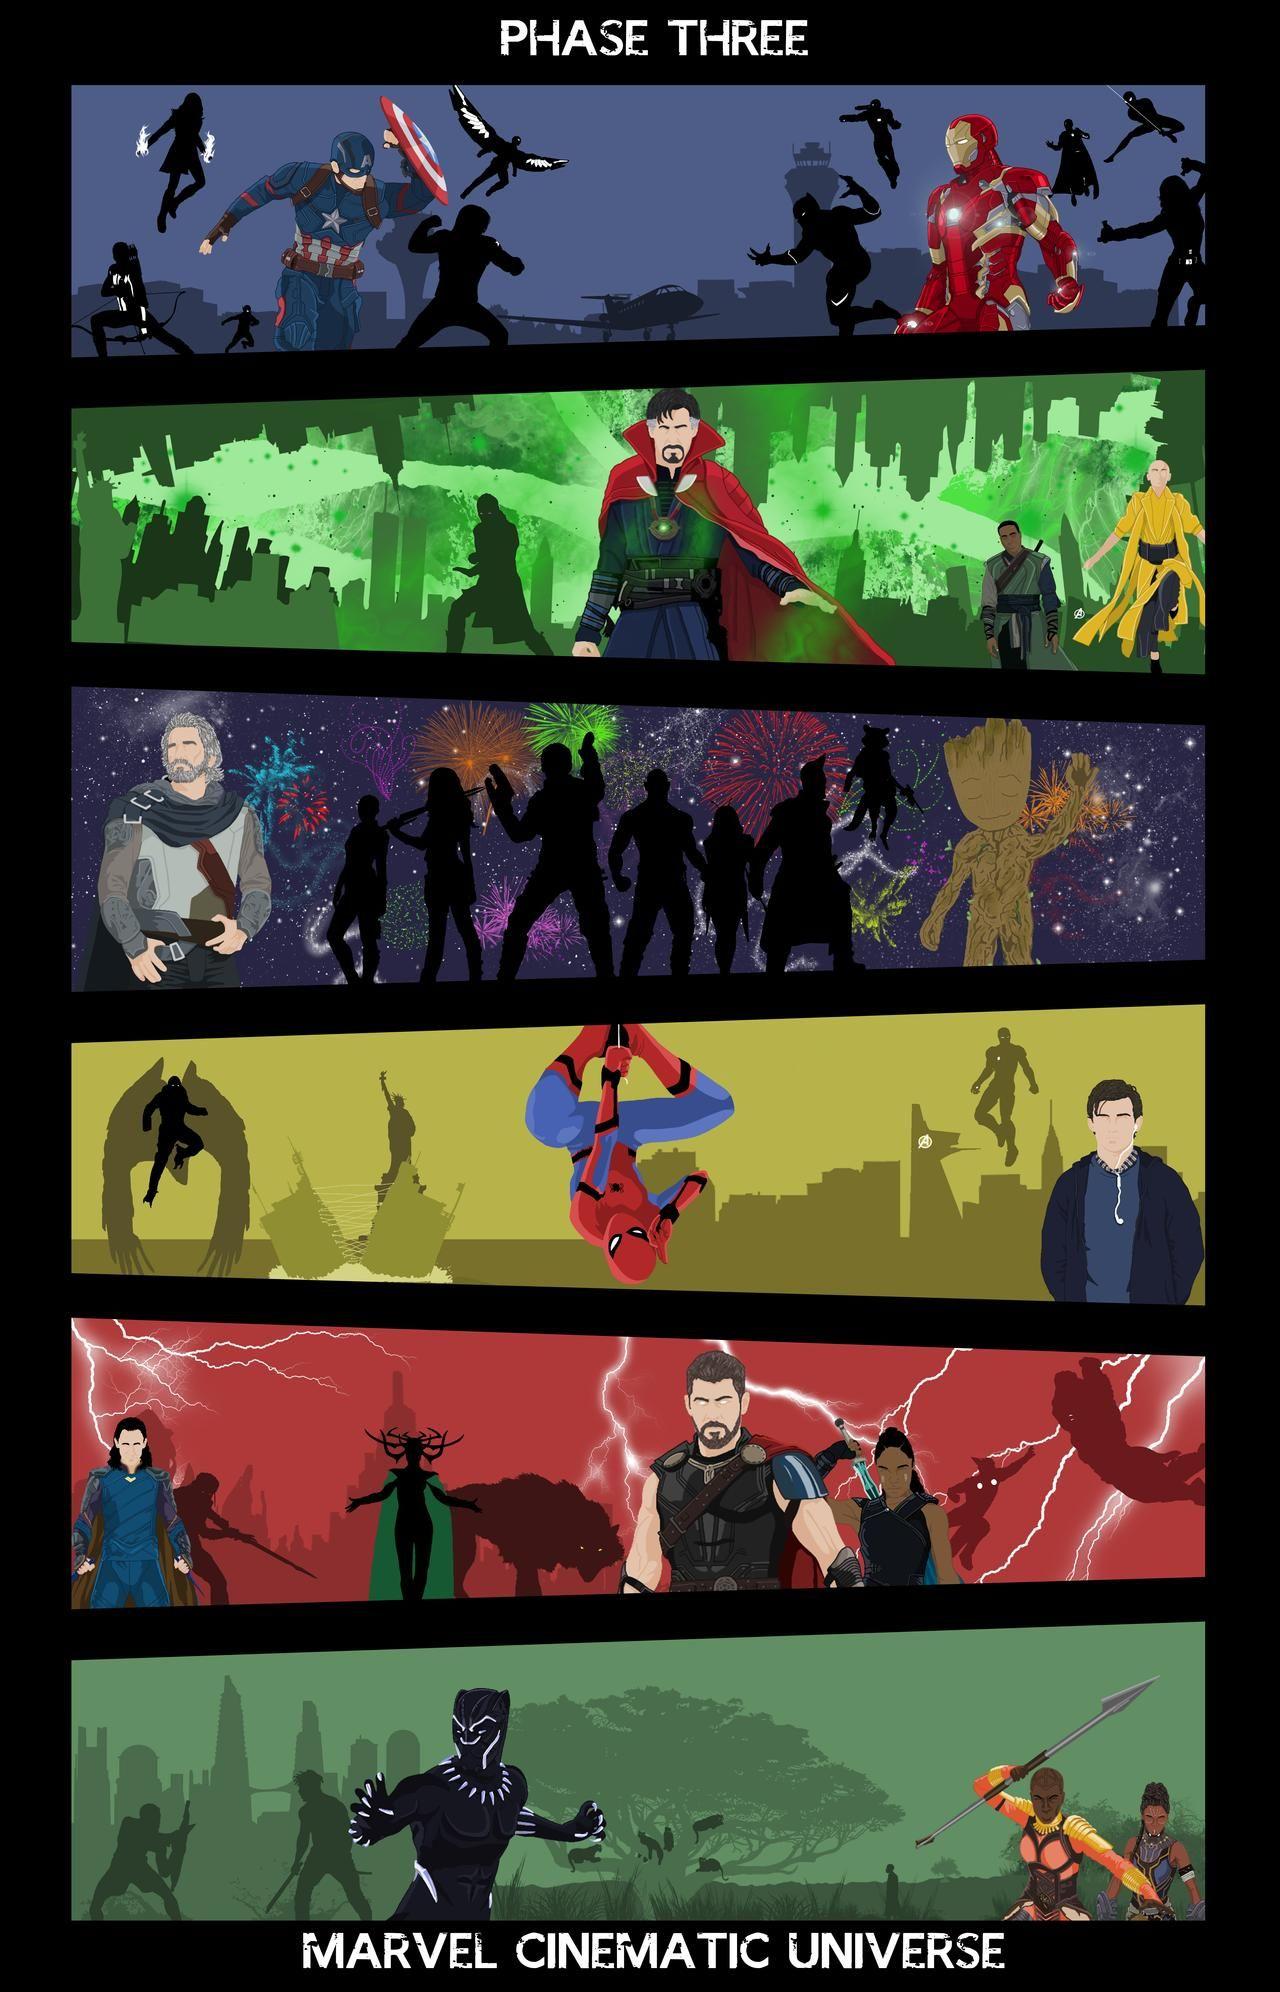 Marvel Cinematic Universe - Phase III Pt 1 Poster by Mr-Saxon on DeviantArt